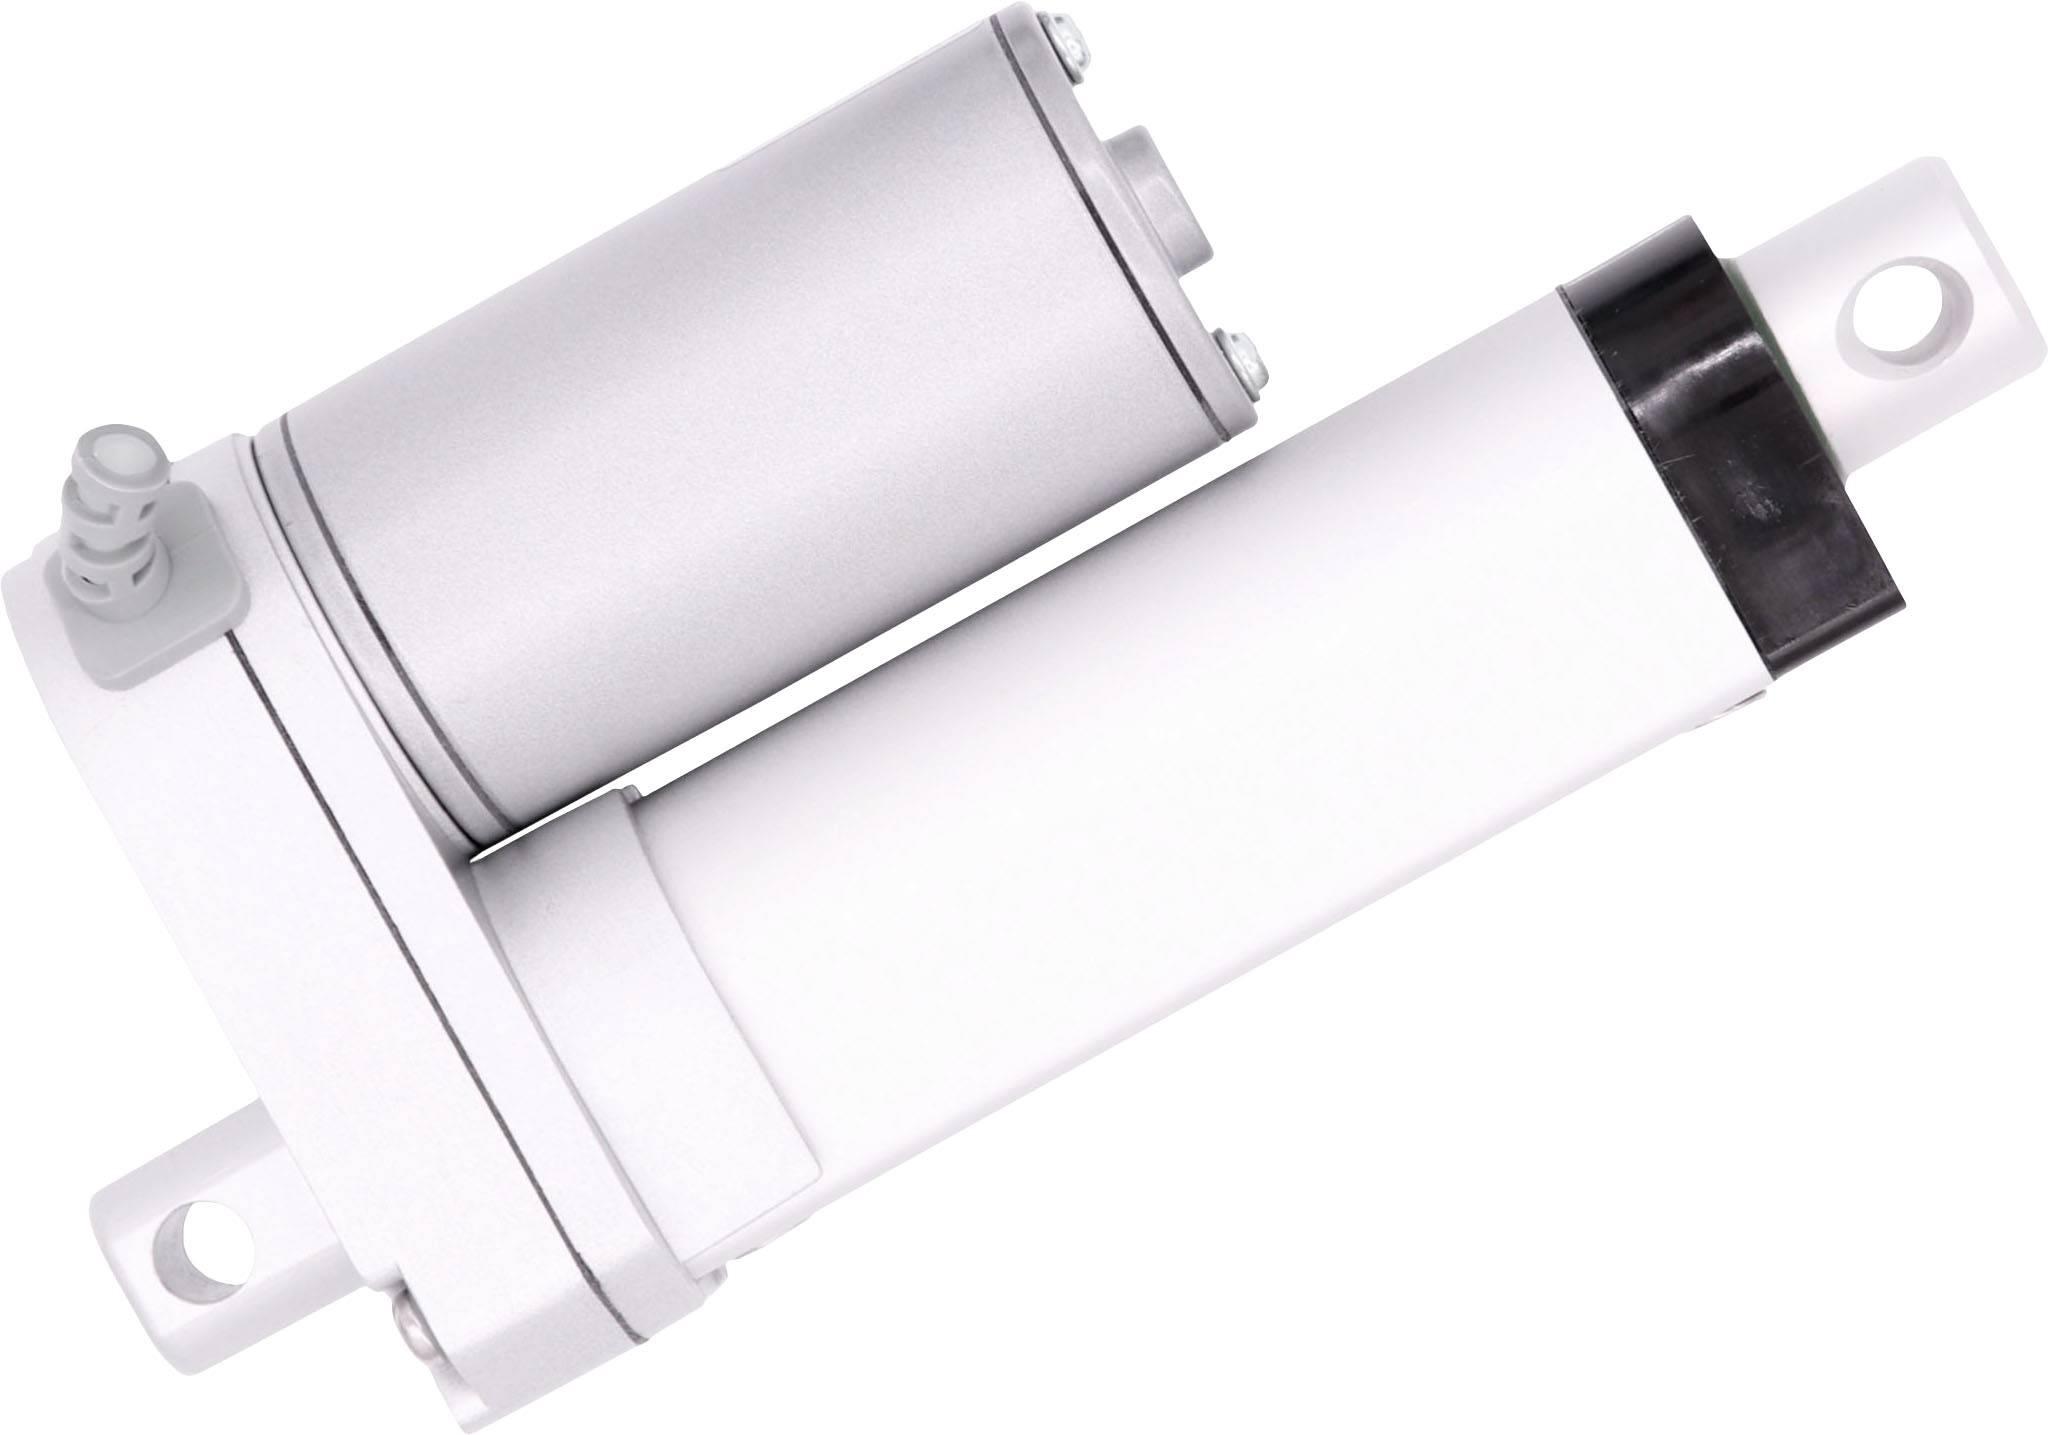 Lineární servomotor Drive-System Europe DSZY1-24-05-A-025-IP65, 150 N, 24 V/DC, délka 25 mm